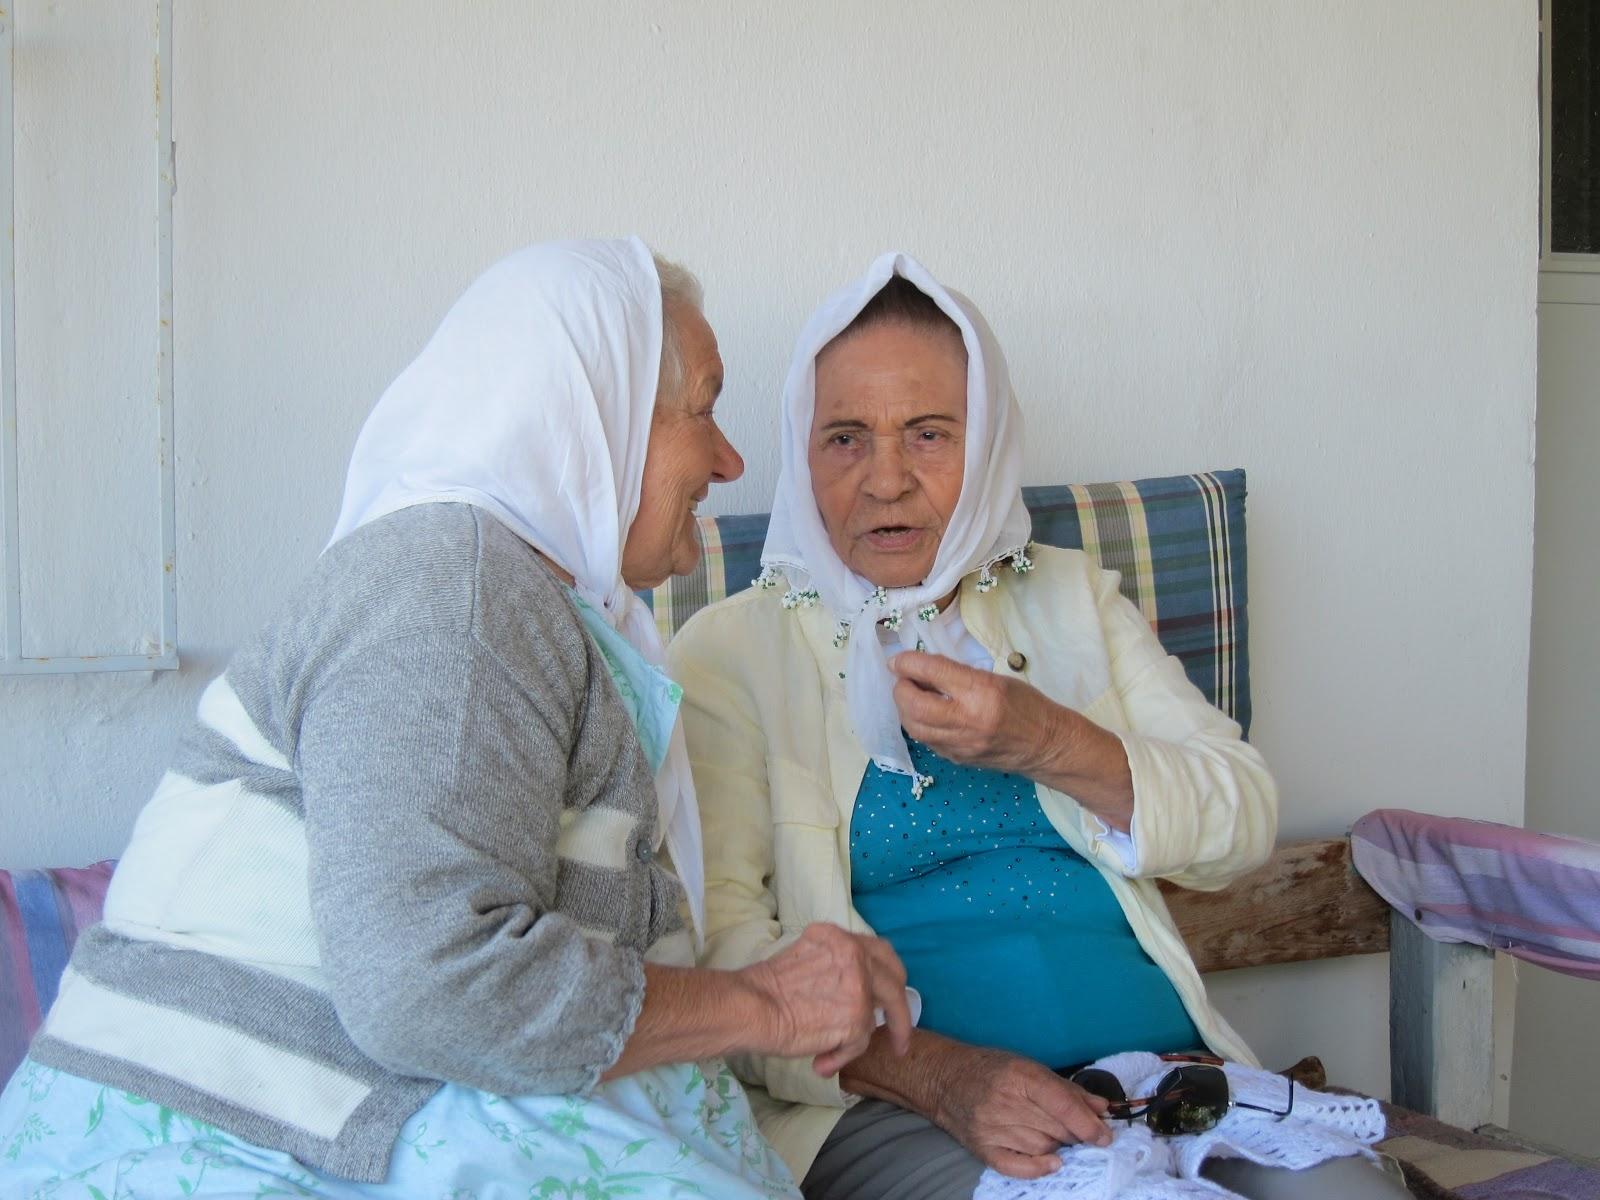 Gillie S Big World Village Life In Northern Lebanon